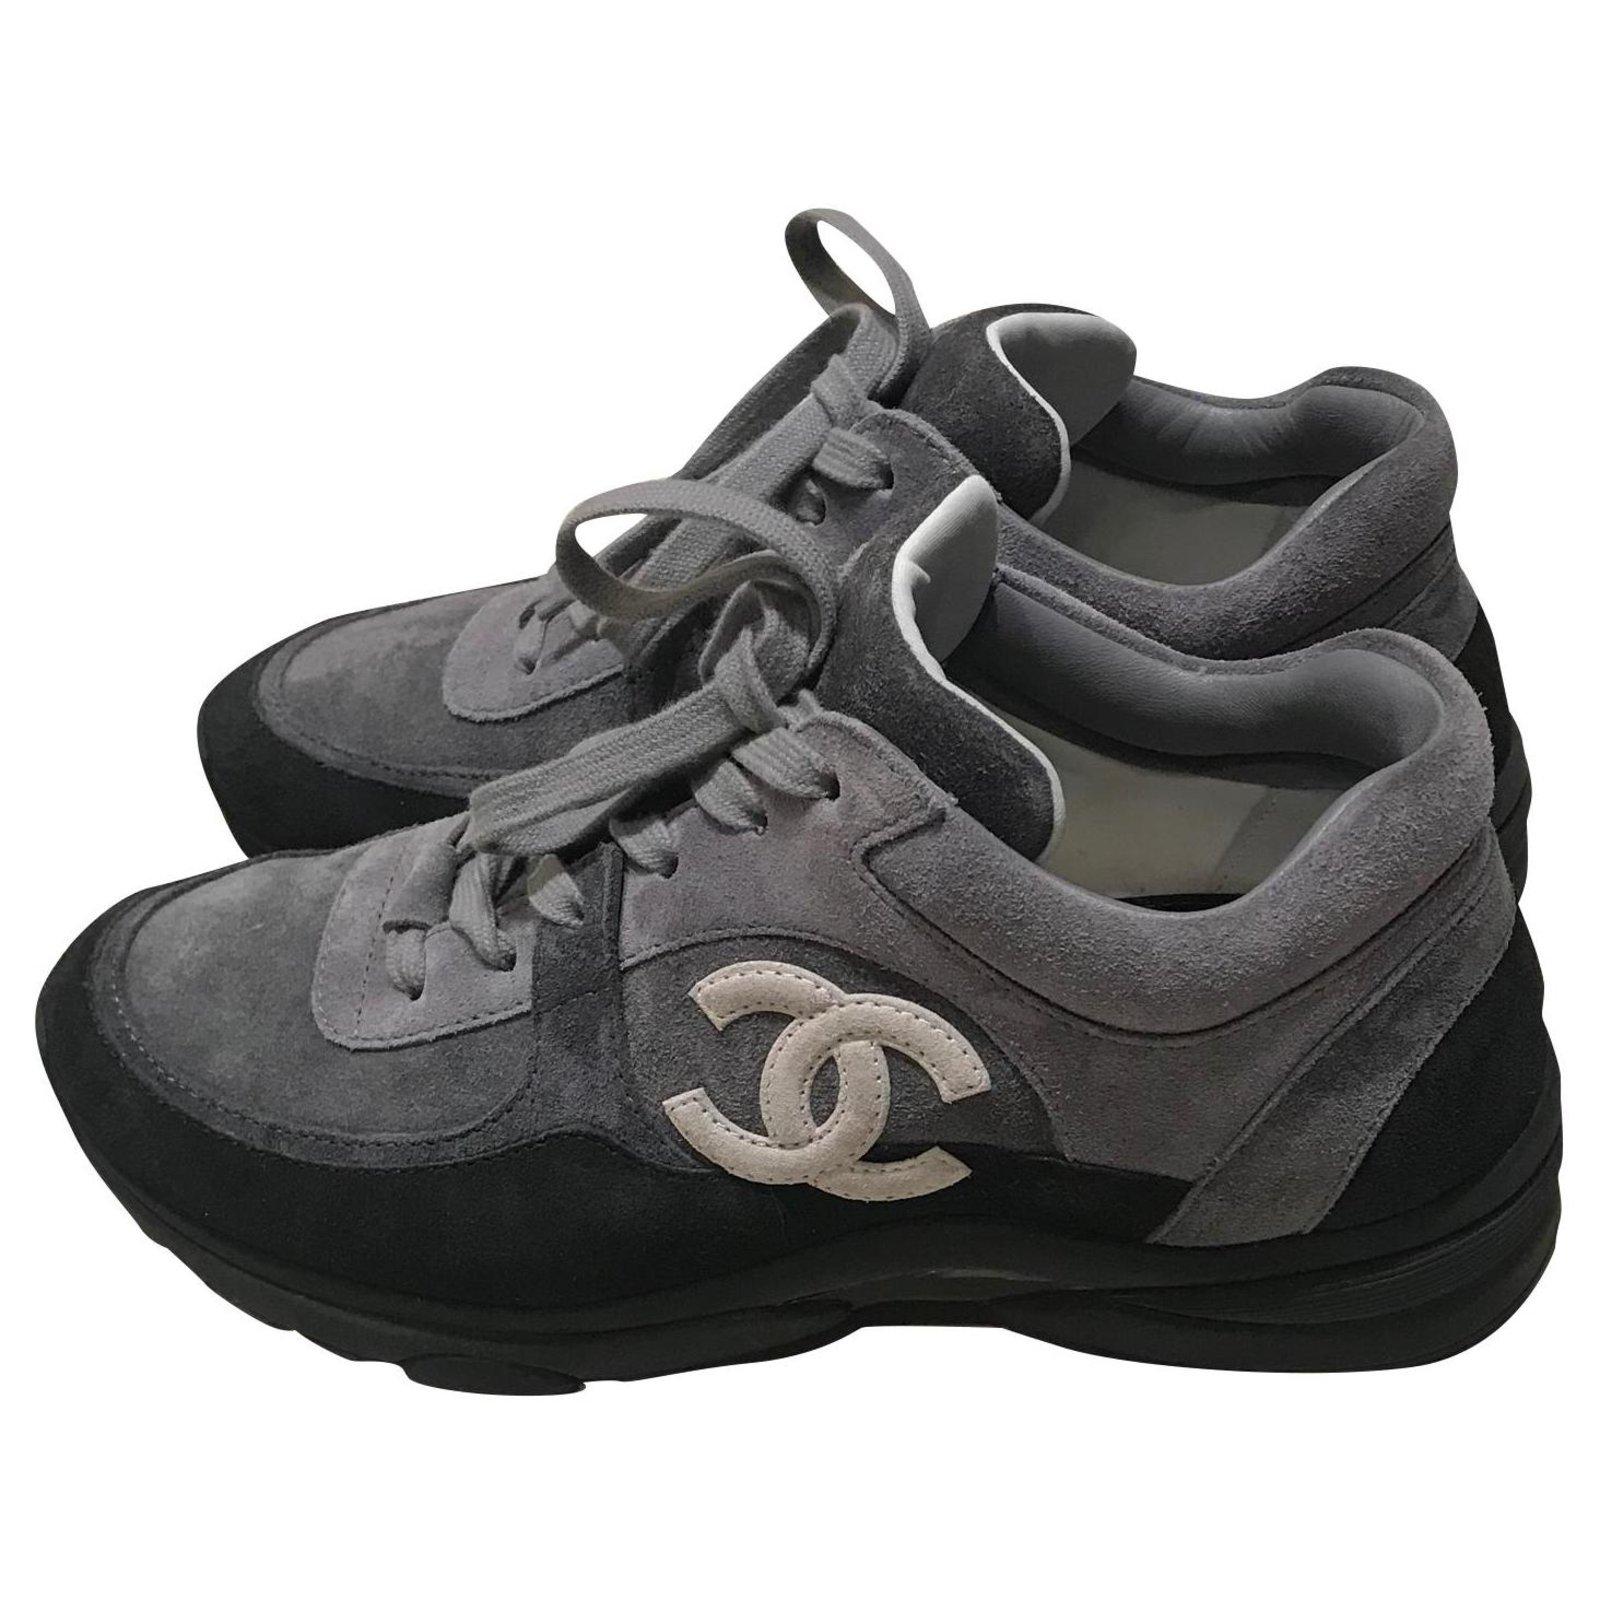 Chanel Sneakers Sneakers Suede Grey ref